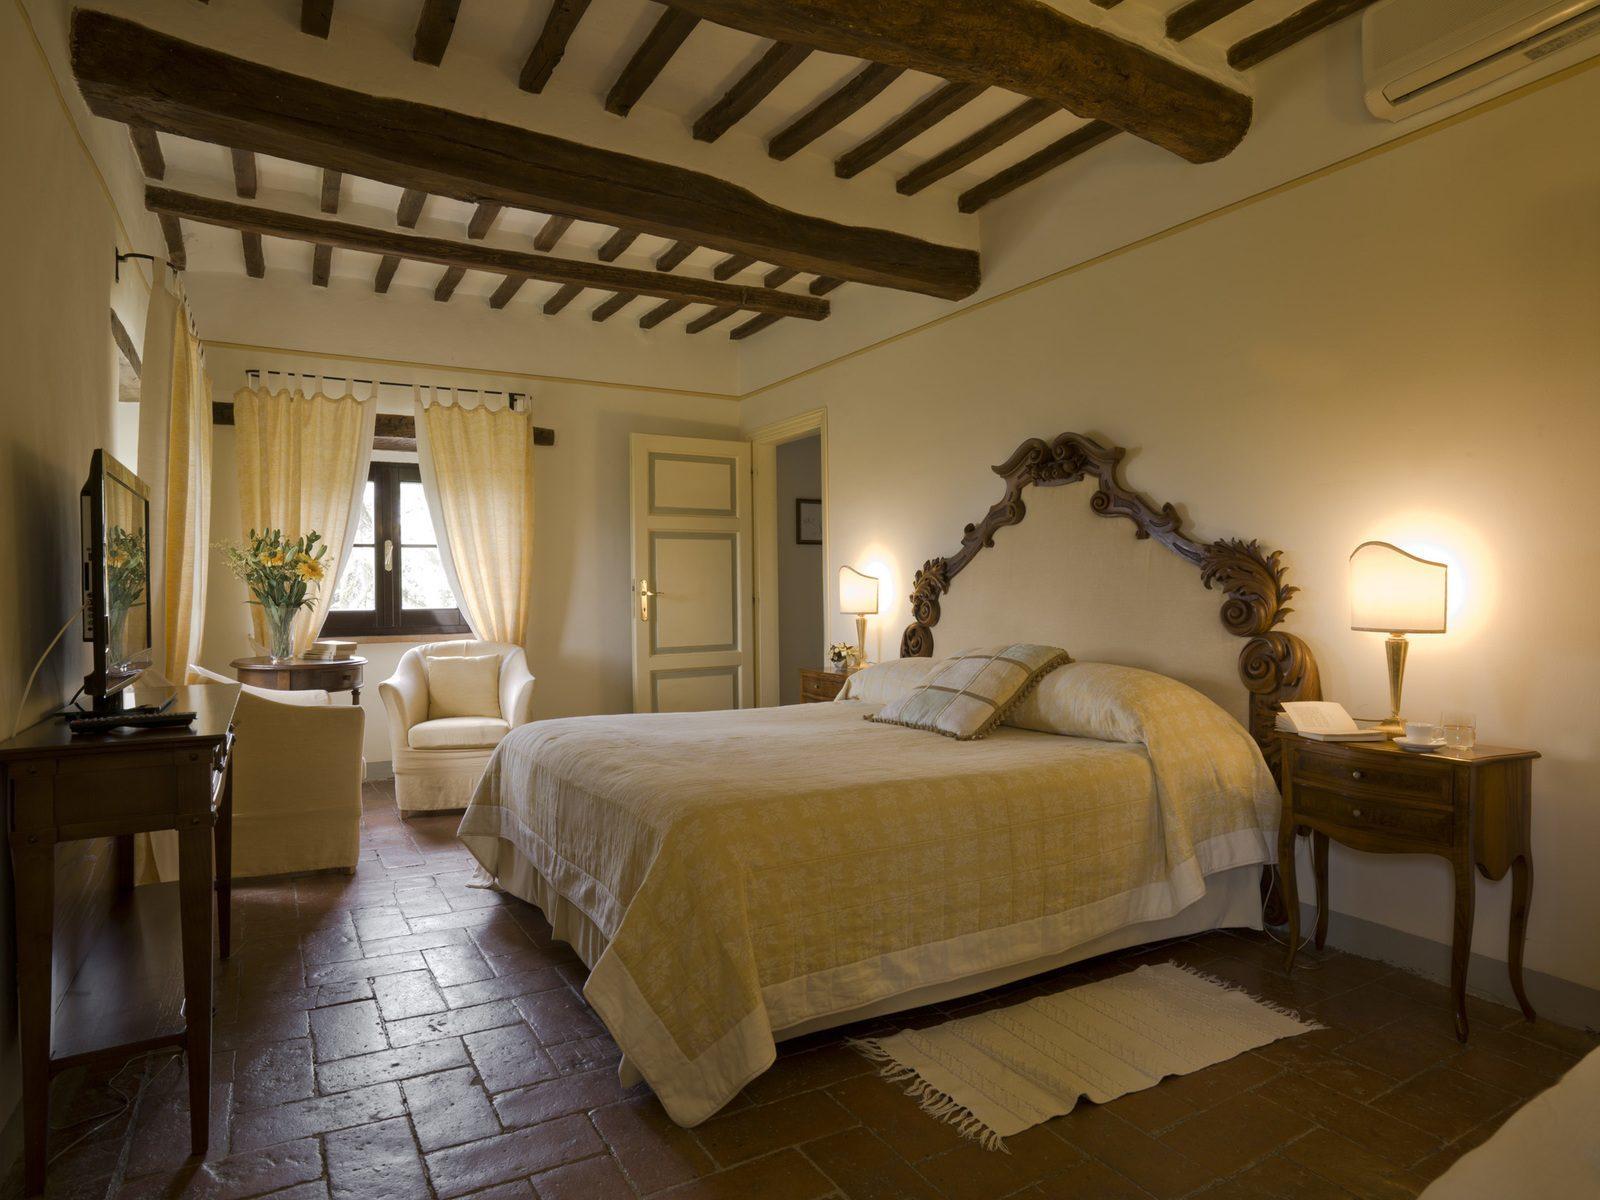 vms-room-suite-deluxe-villa-1